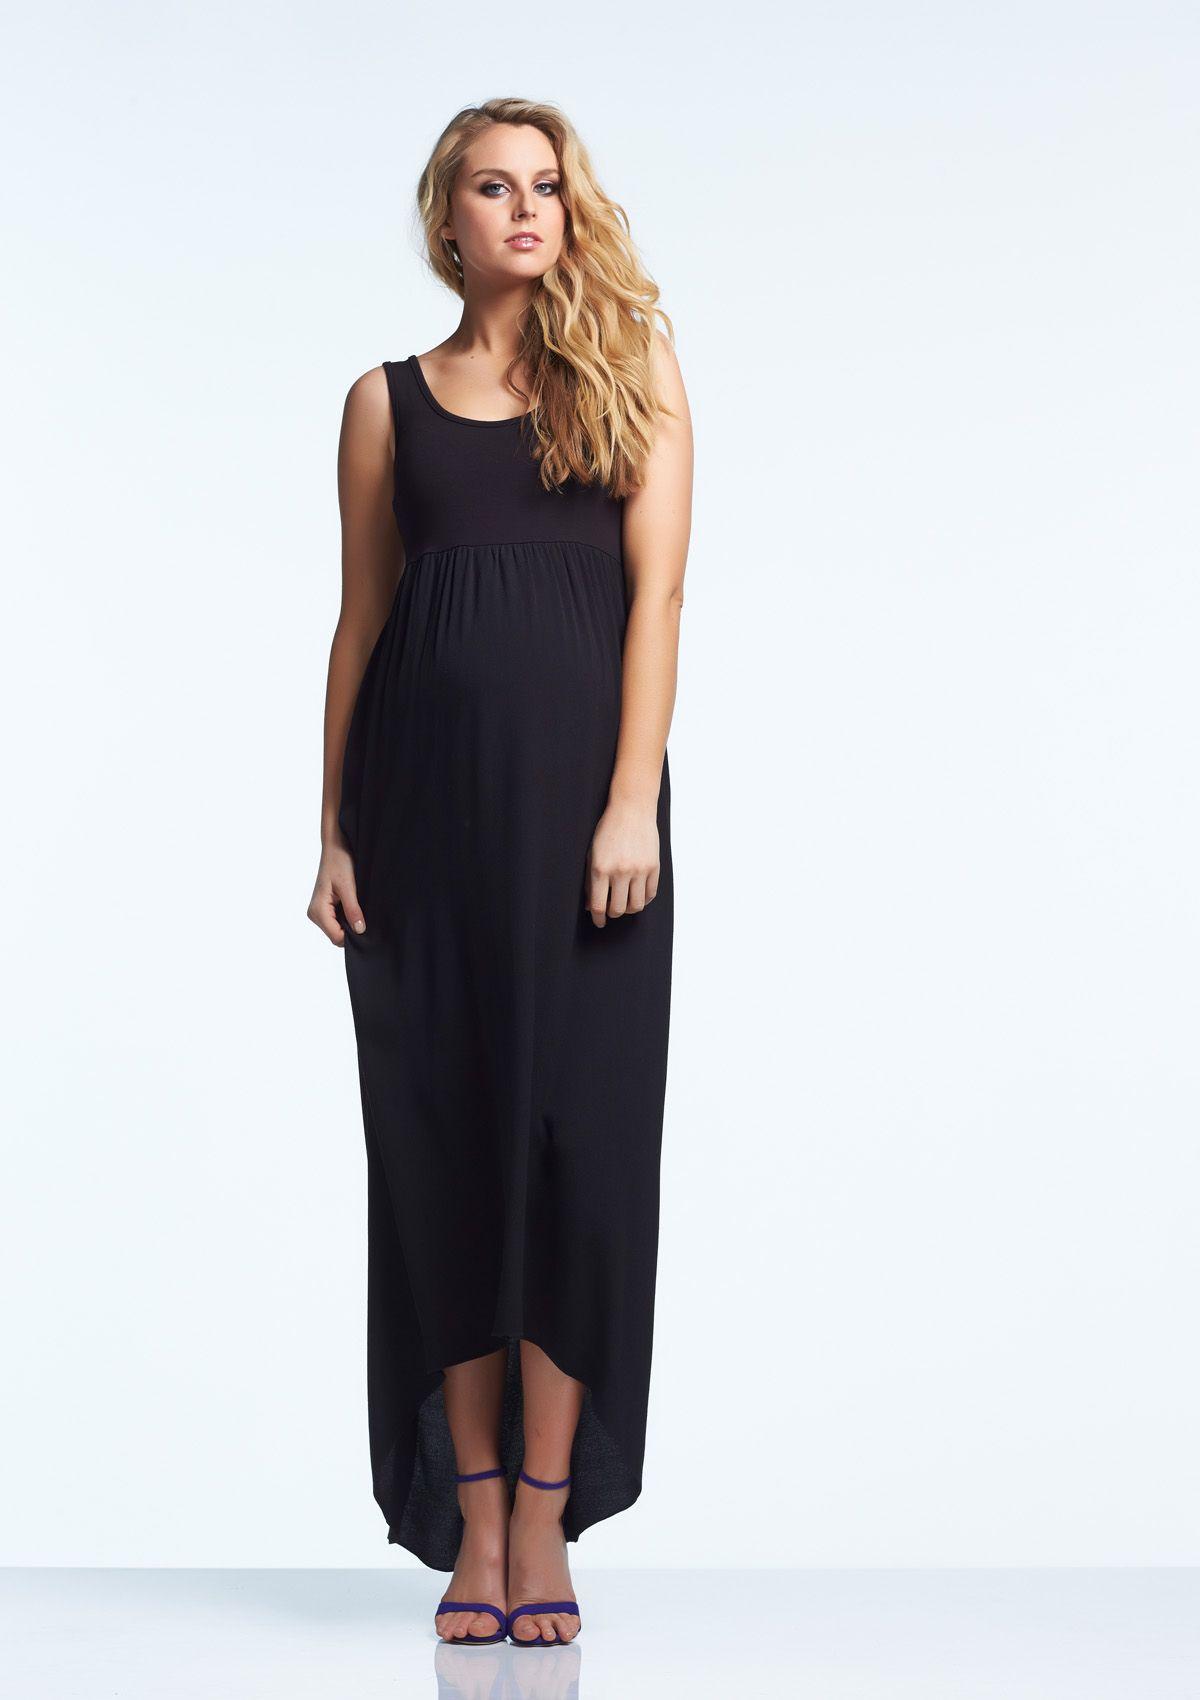 2cf583b08b7e Sia maternity maxi dress cute maternity fashion pinterest jpg 1200x1700 Sia  clothes. Download Image